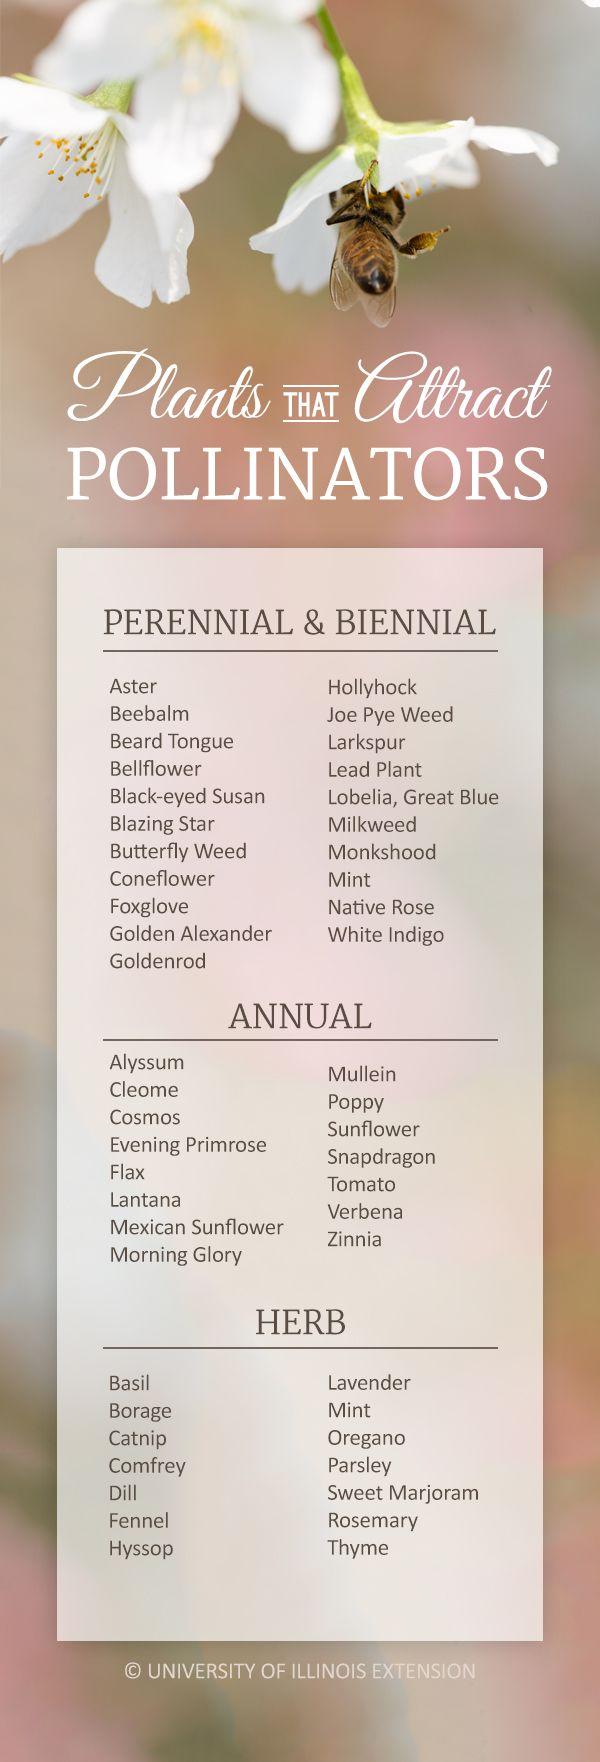 A handy list of plants that attract pollinators! (butterflies, bees, hummingbirds, etc.) #garden #flowers